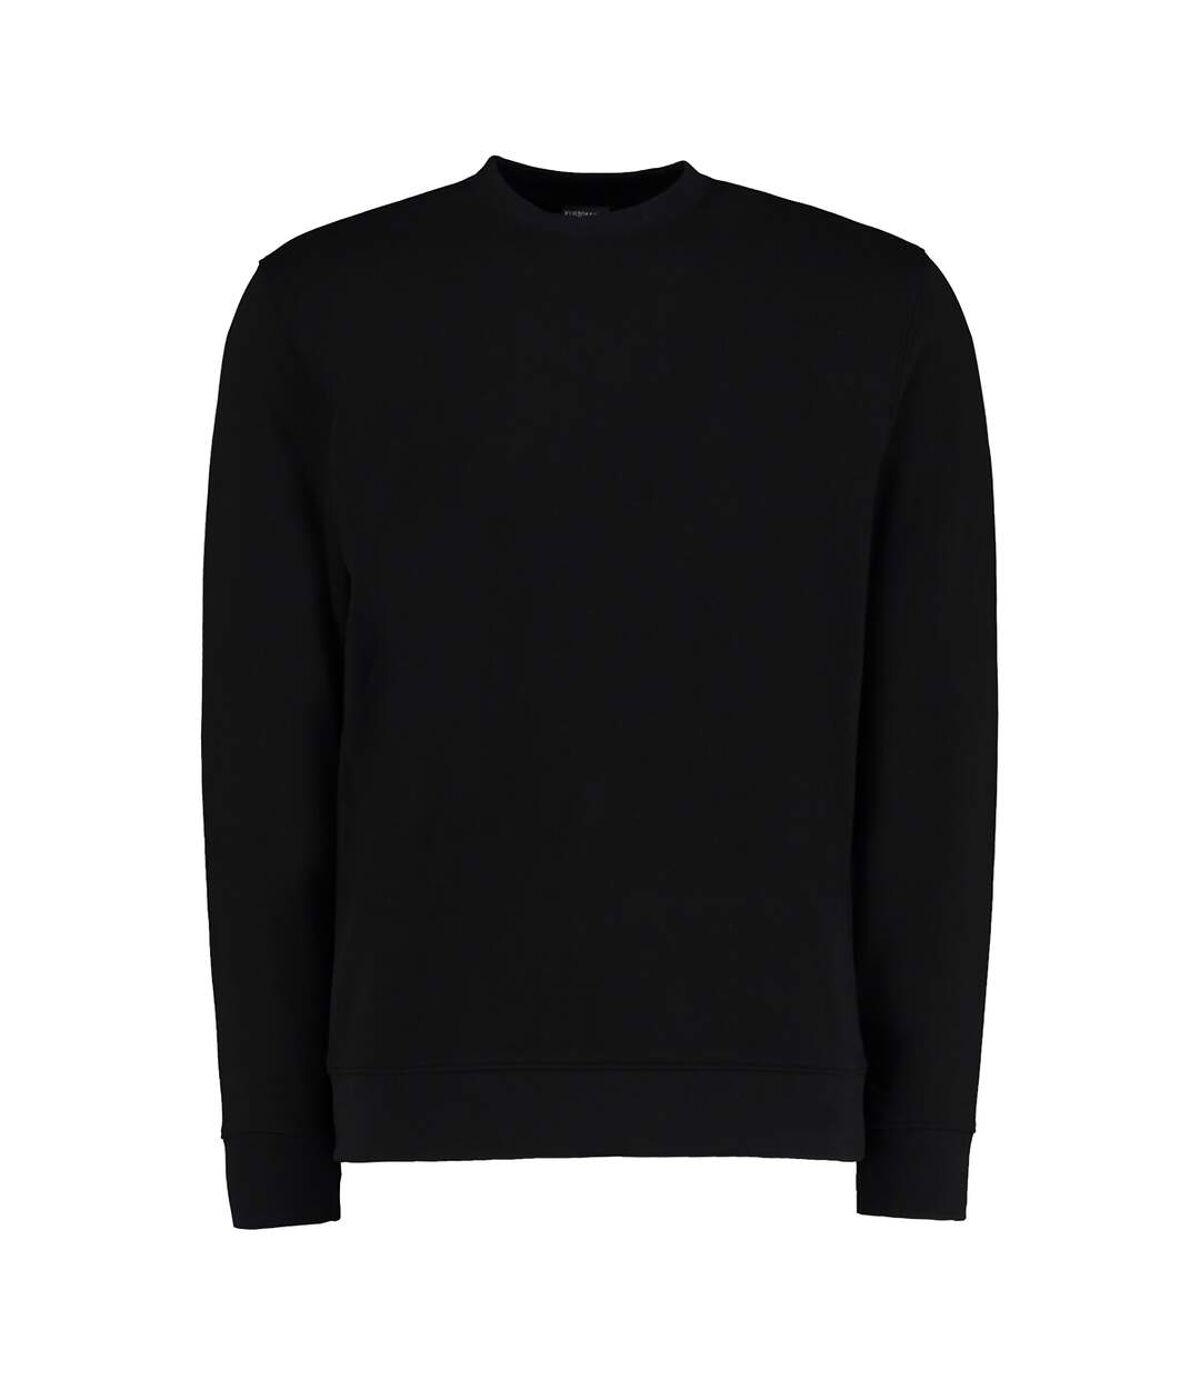 Kustom Kit Klassic - Sweat-shirt - Homme (Noir) - UTBC3725